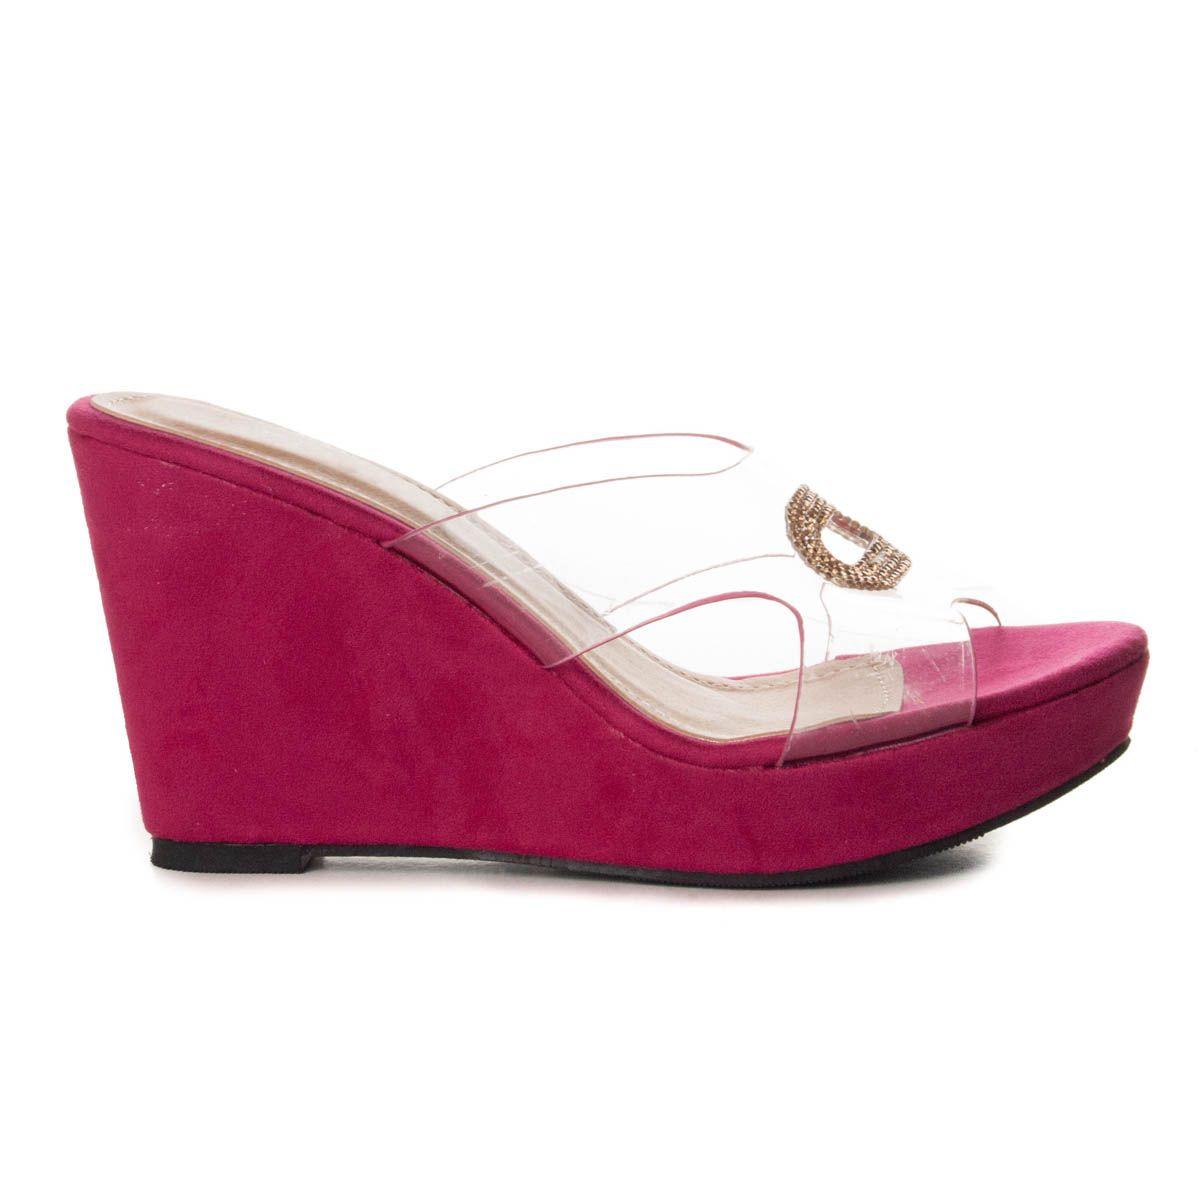 Montevita Chunky Heel Sandal in Fuchsia